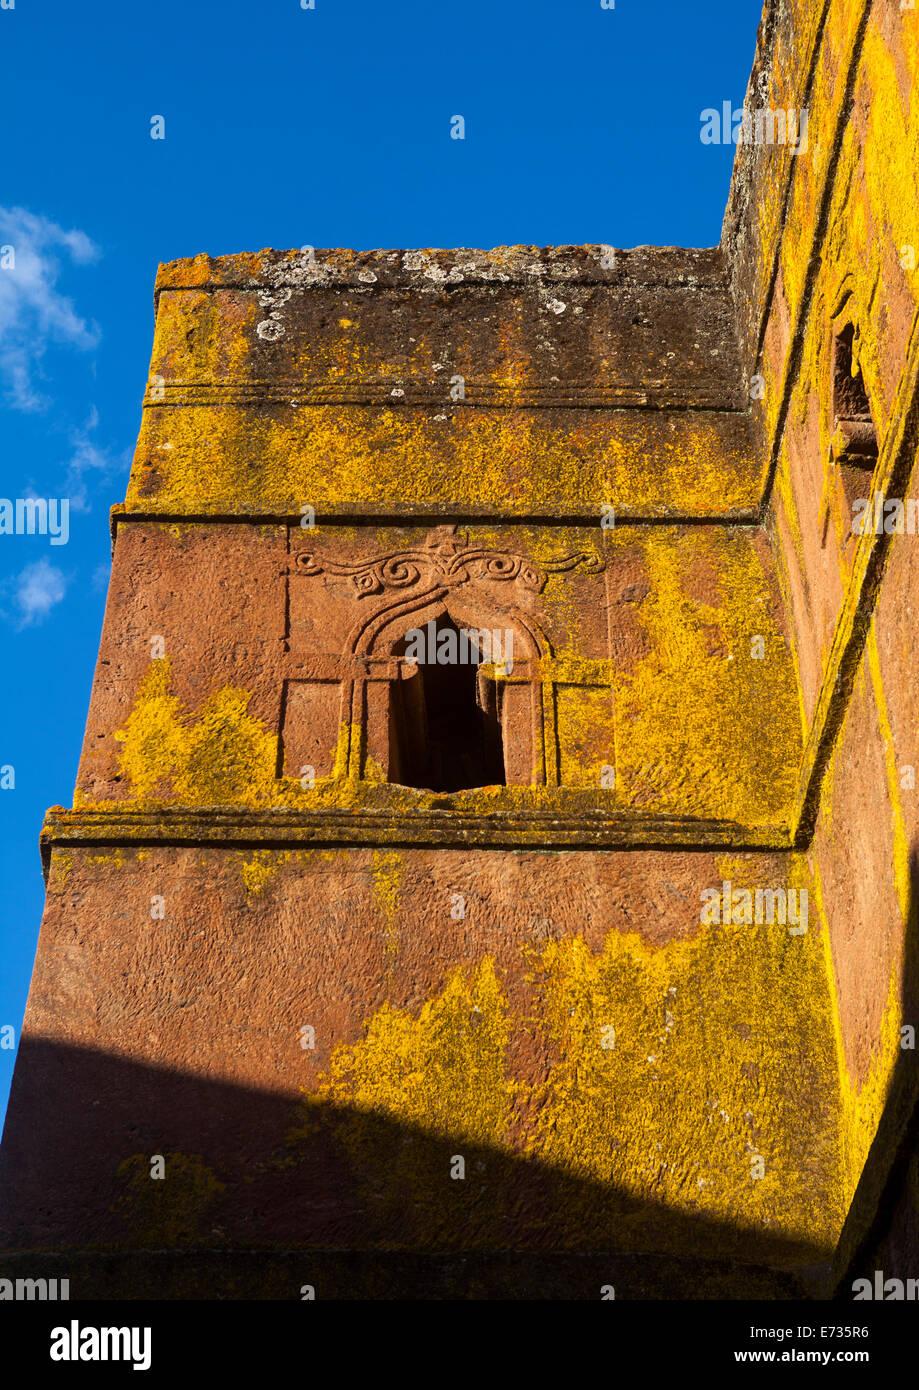 Monolithic Rock-cut Church Of Bete Giyorgis, Lalibela, Ethiopia Stock Photo